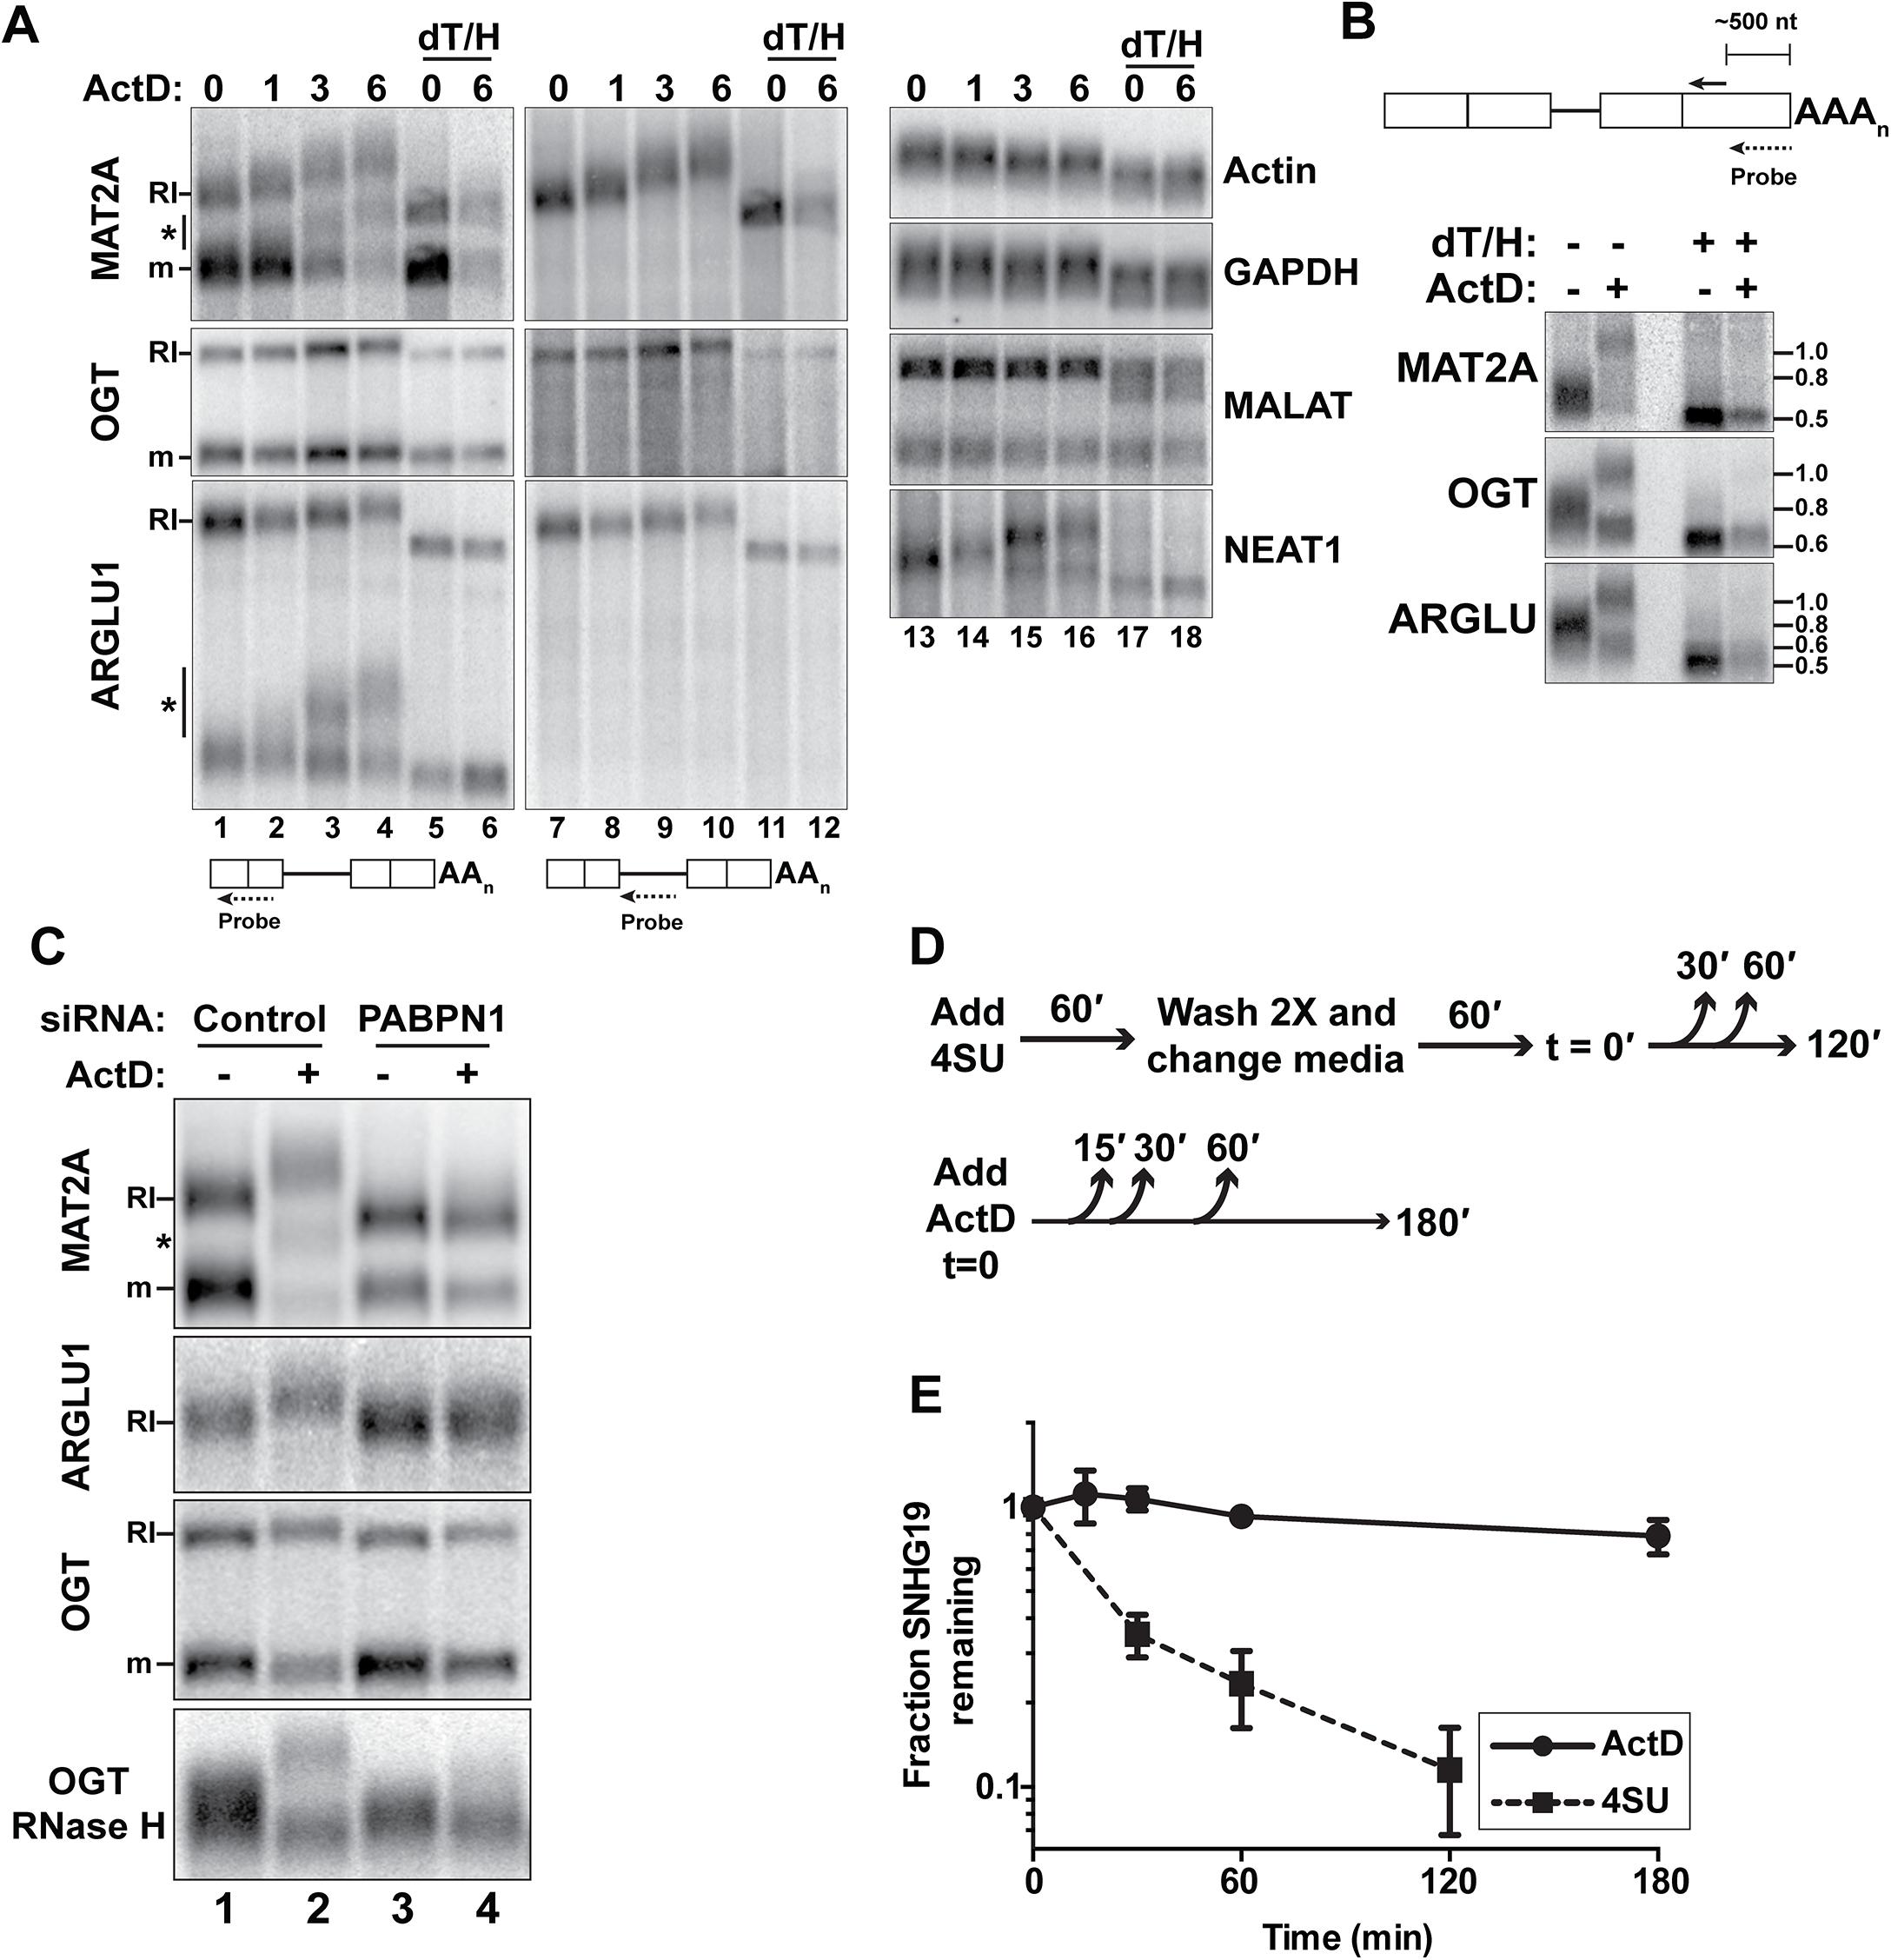 RI-RNAs are hyperadenylated upon ActD treatment.